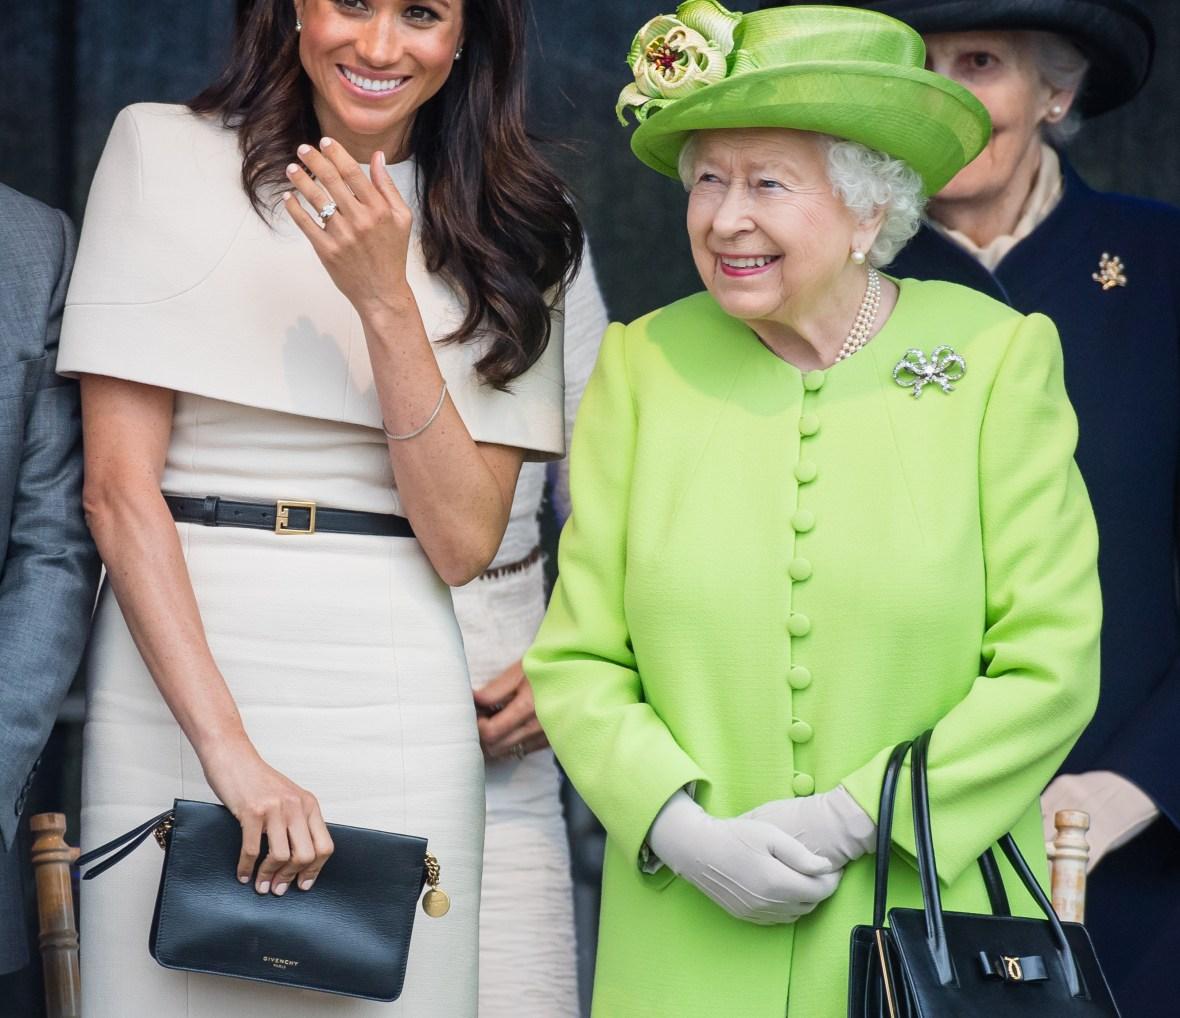 queen elizabeth meghan markle getty images